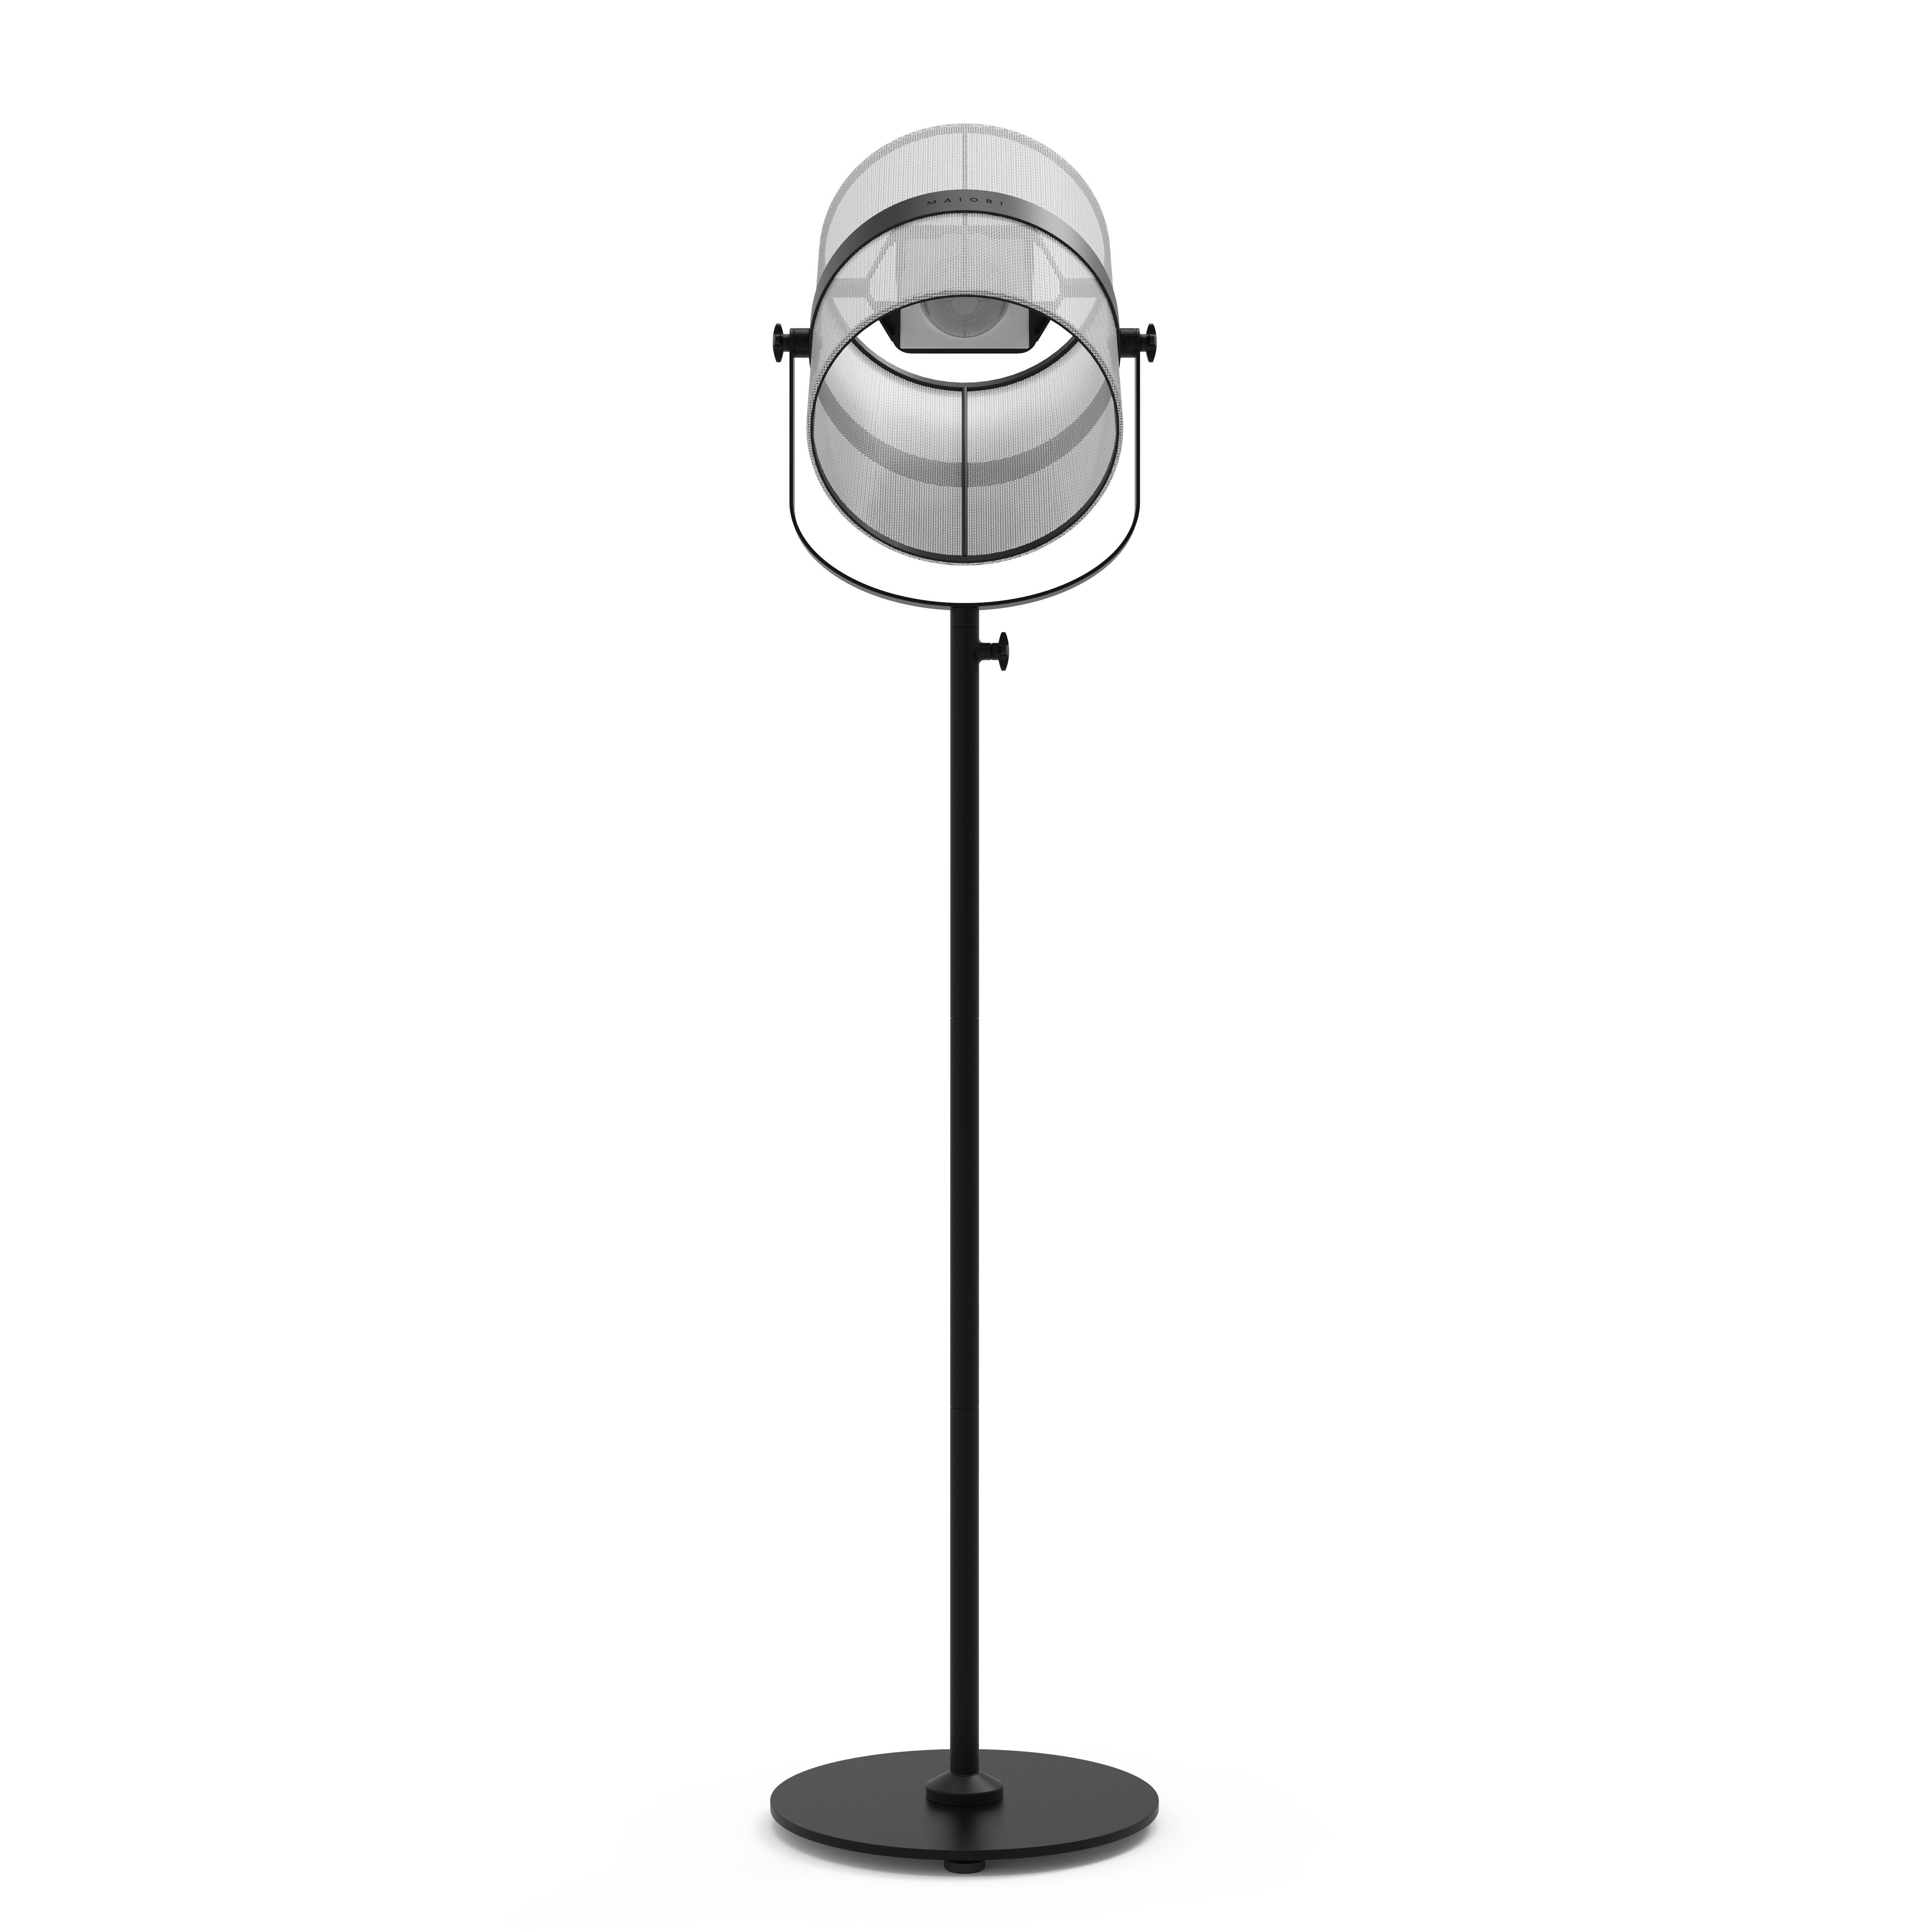 Luminaire - Lampadaires - Lampadaire solaire La Lampe Paris LED / Hybride & connectée - Maiori - Blanc / Pied Charbon - Aluminium peint, Tissu